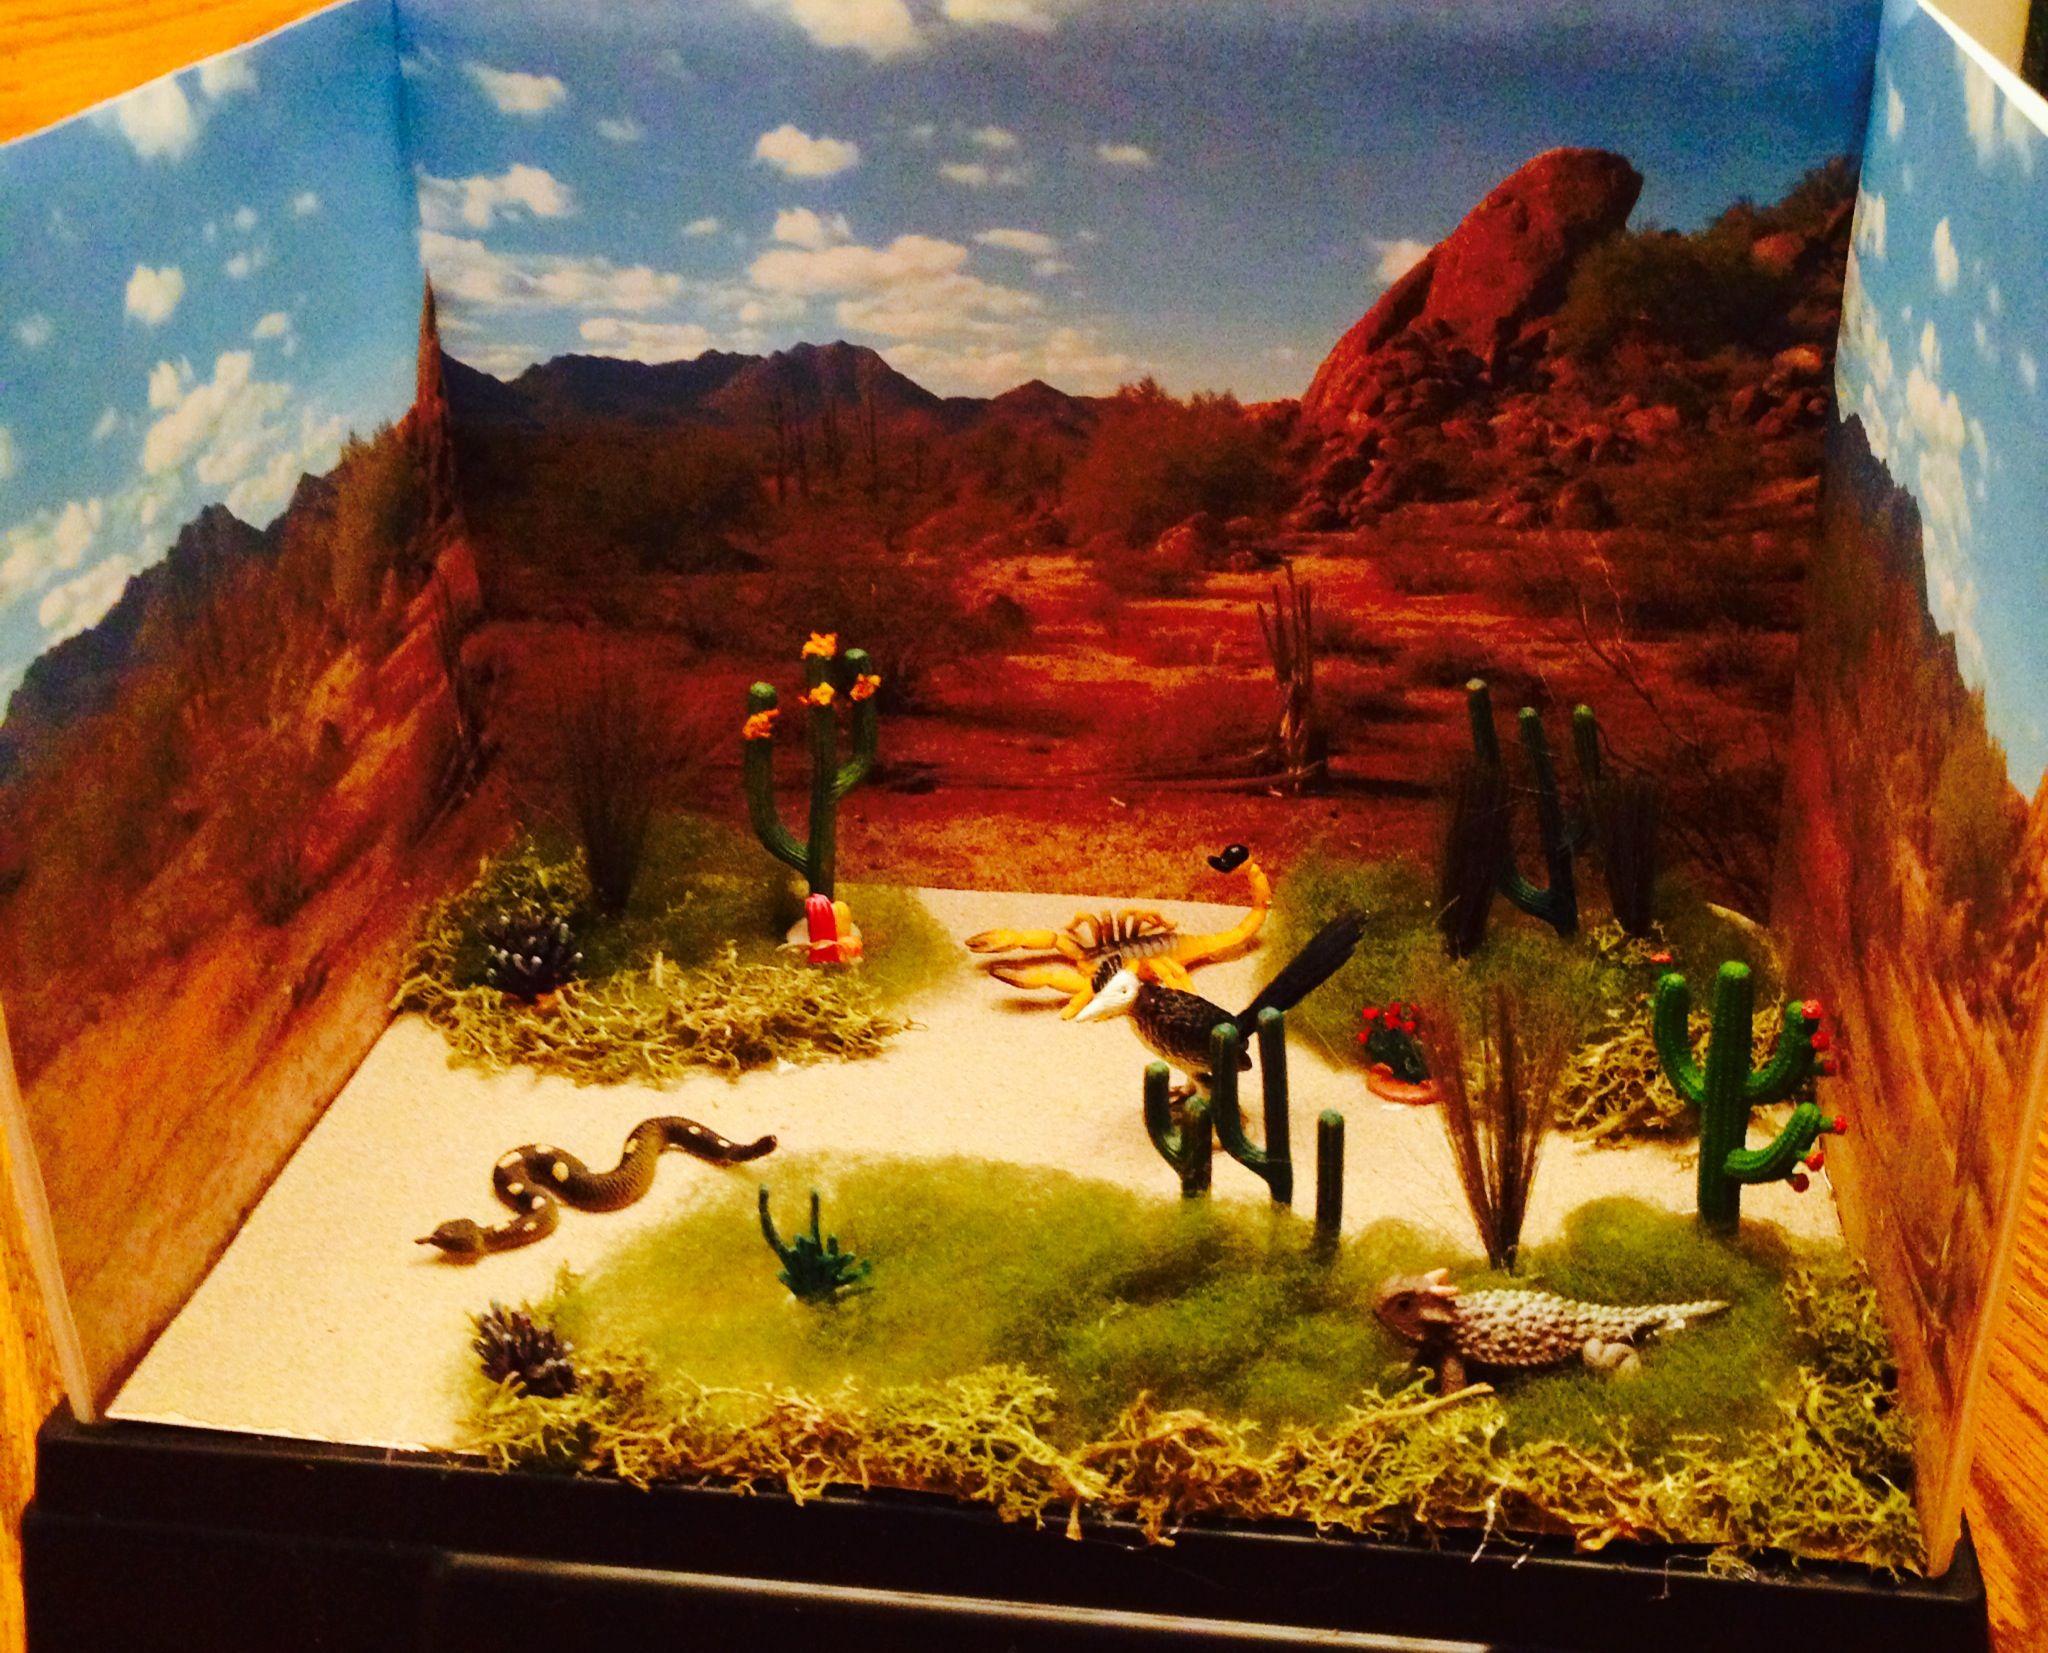 Desert Diorama Desert diorama, Habitats projects, Biomes